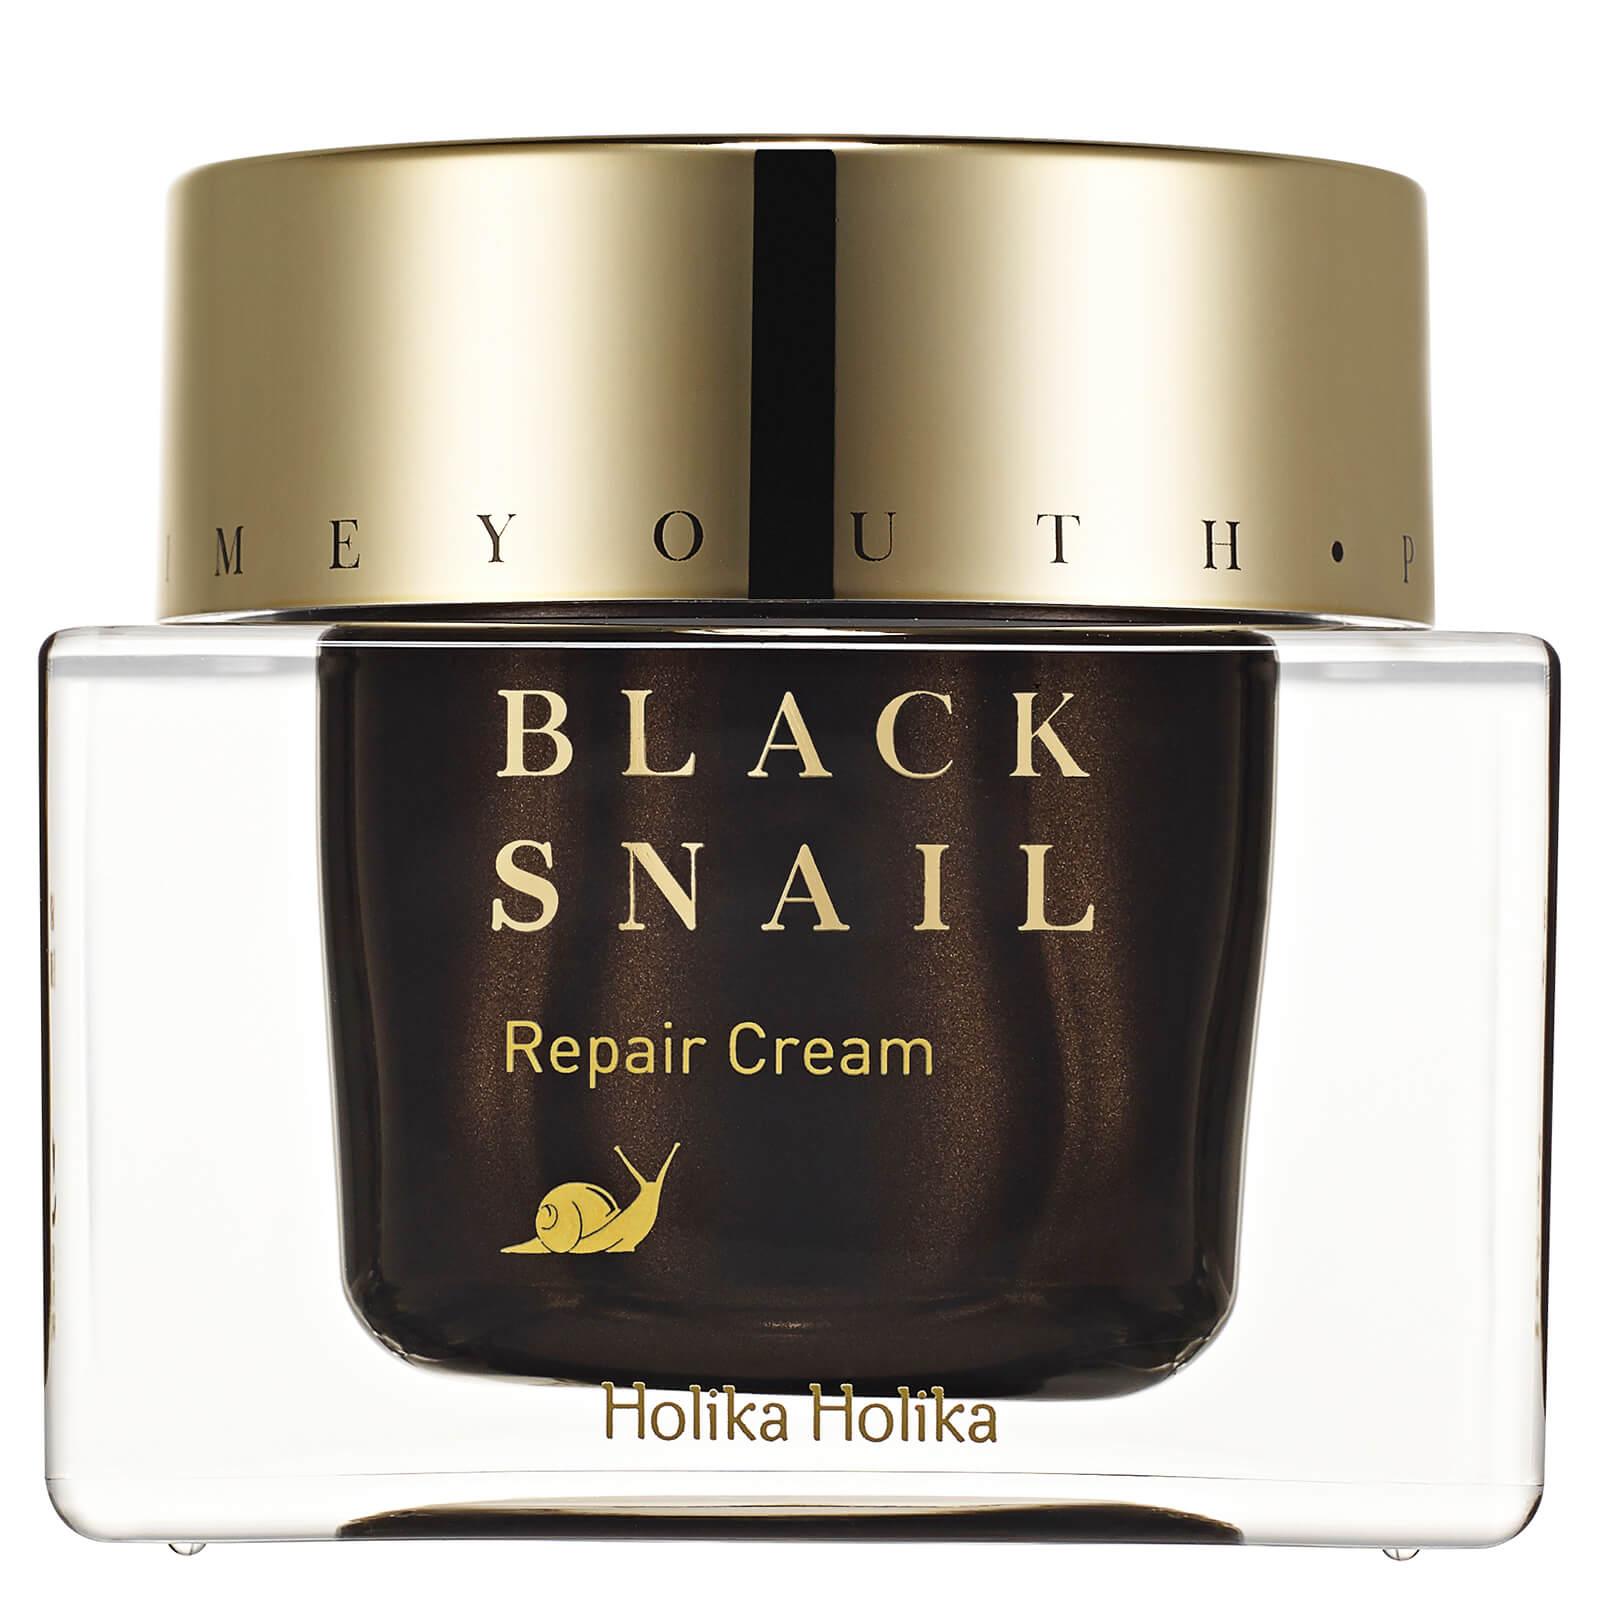 Holika Holika Prime Youth Black Snail crema riparatrice alla bava di lumaca